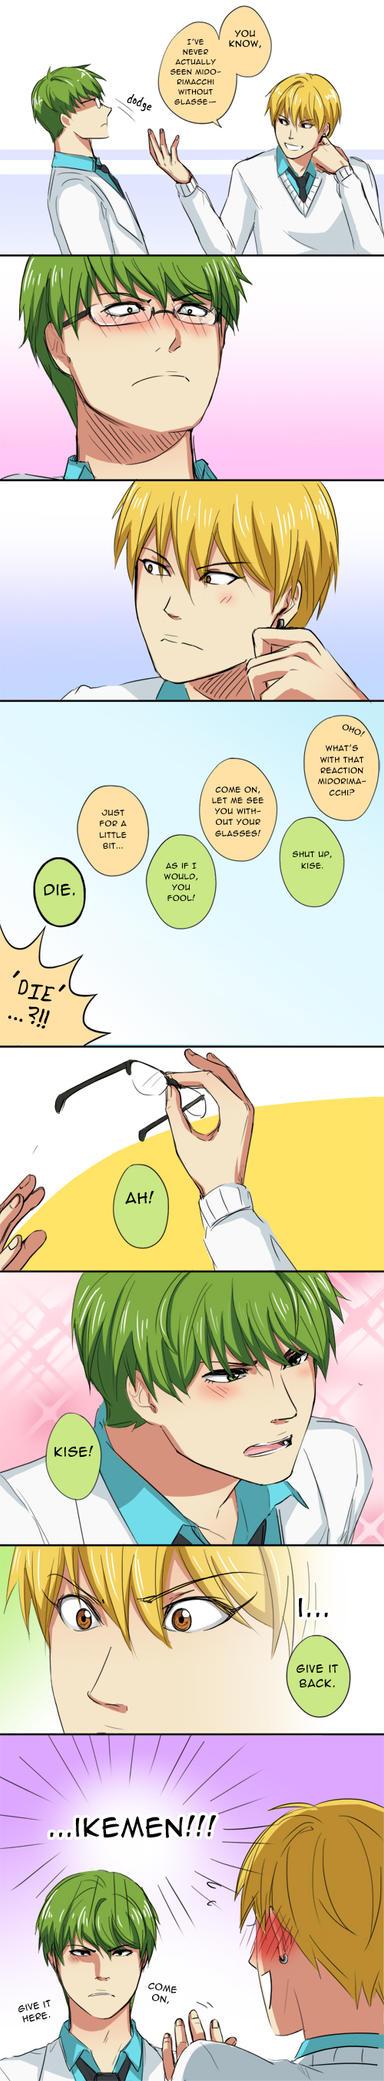 MidoKi - Glasses by Amanduur